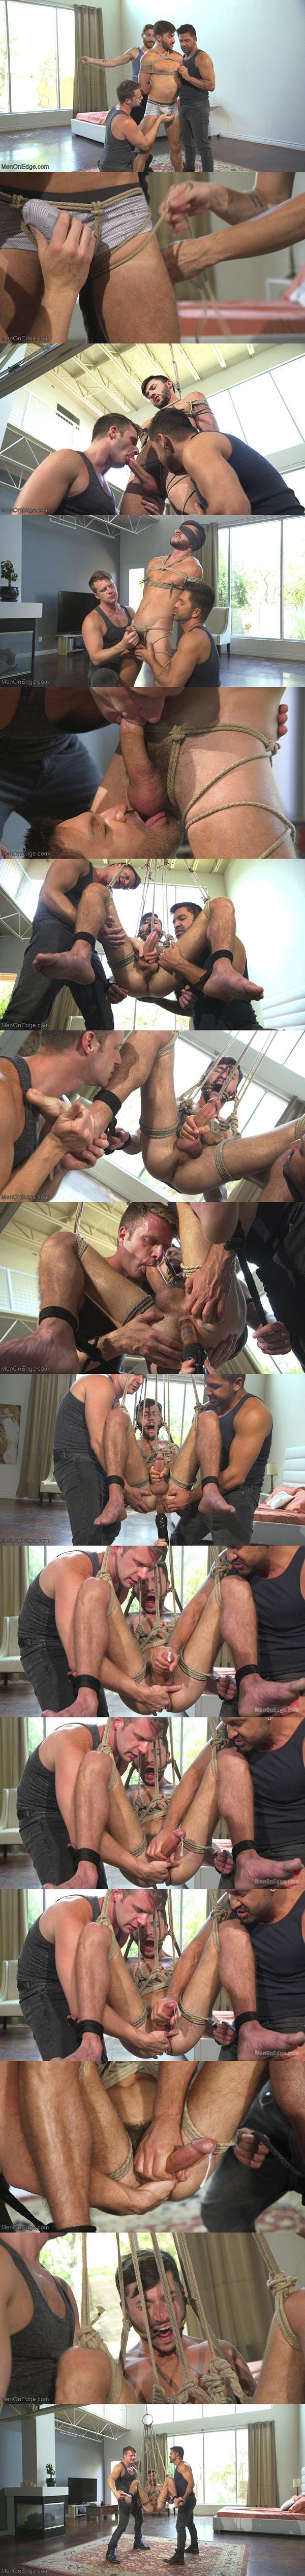 Big dicked lean hunk Scott DeMarco blows his load mid-air at Menonedge 02